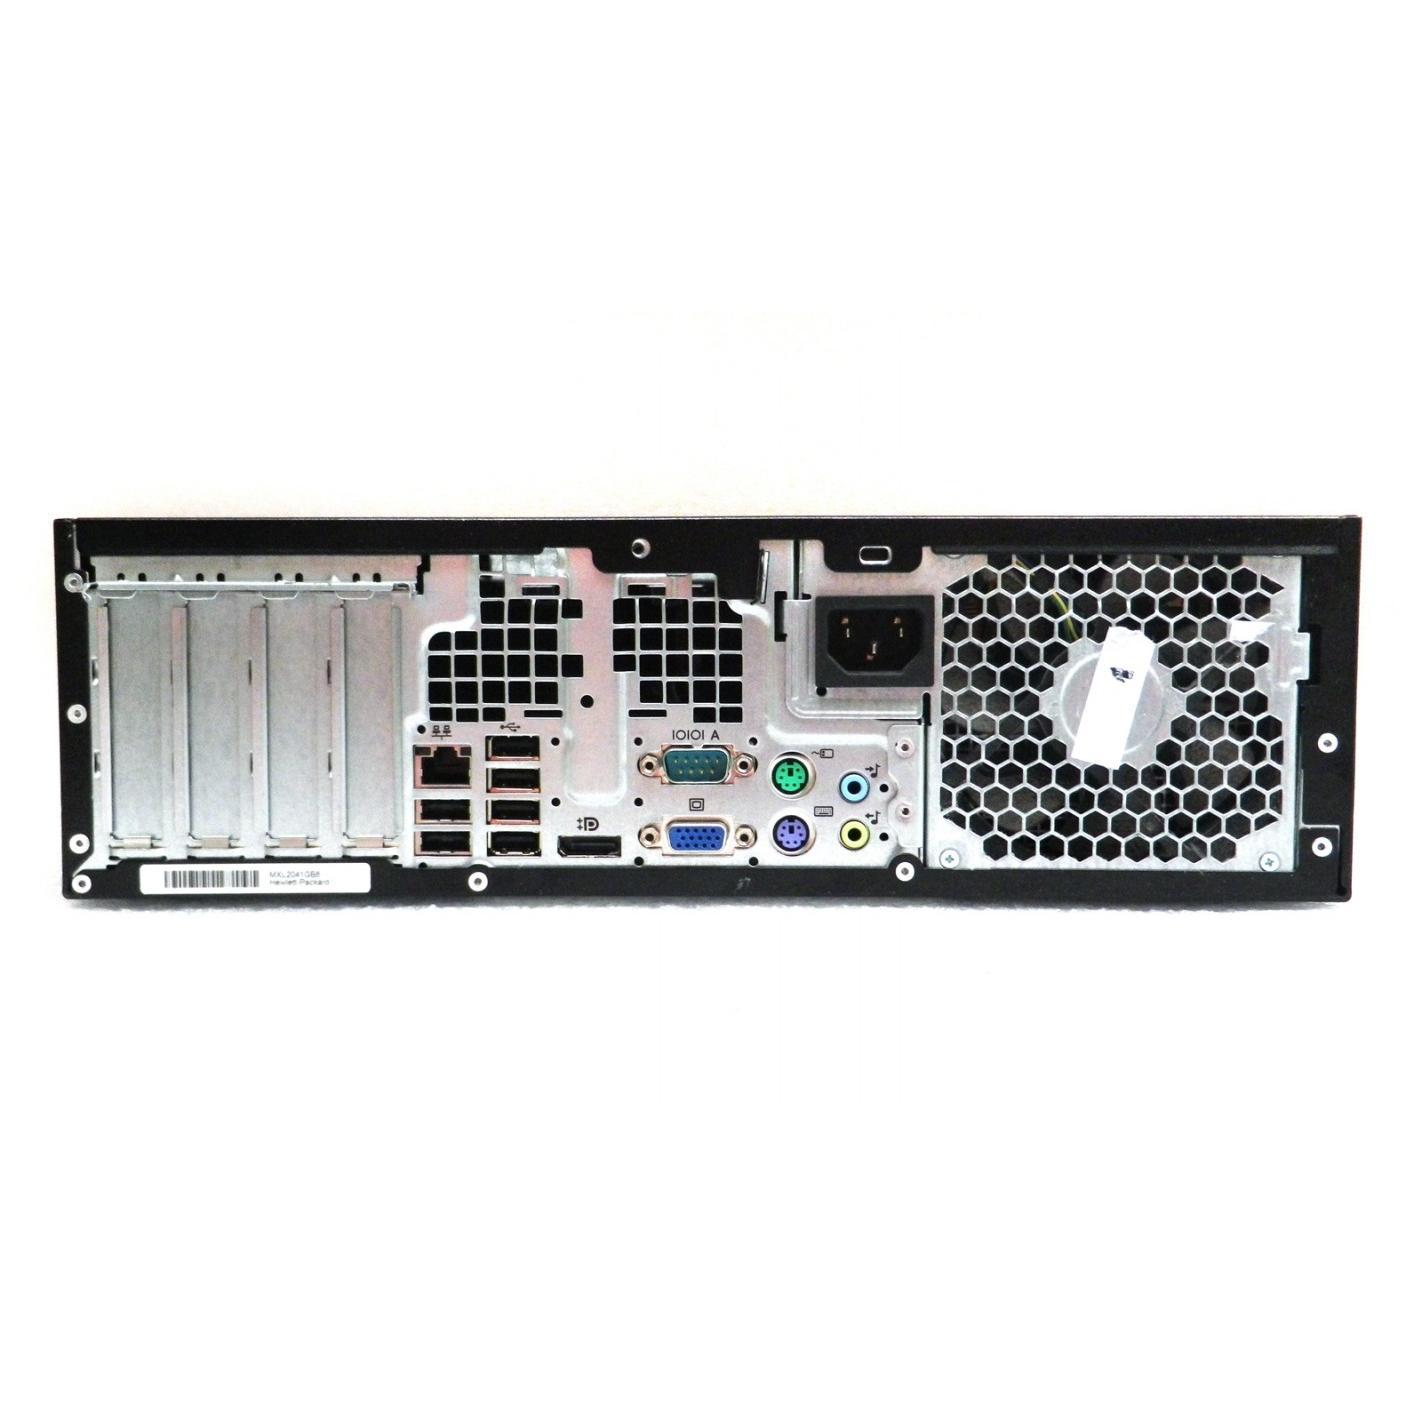 HP Compaq Elite 8200 SFF Core i7 3,4 GHz - SSD 240 GB RAM 8GB